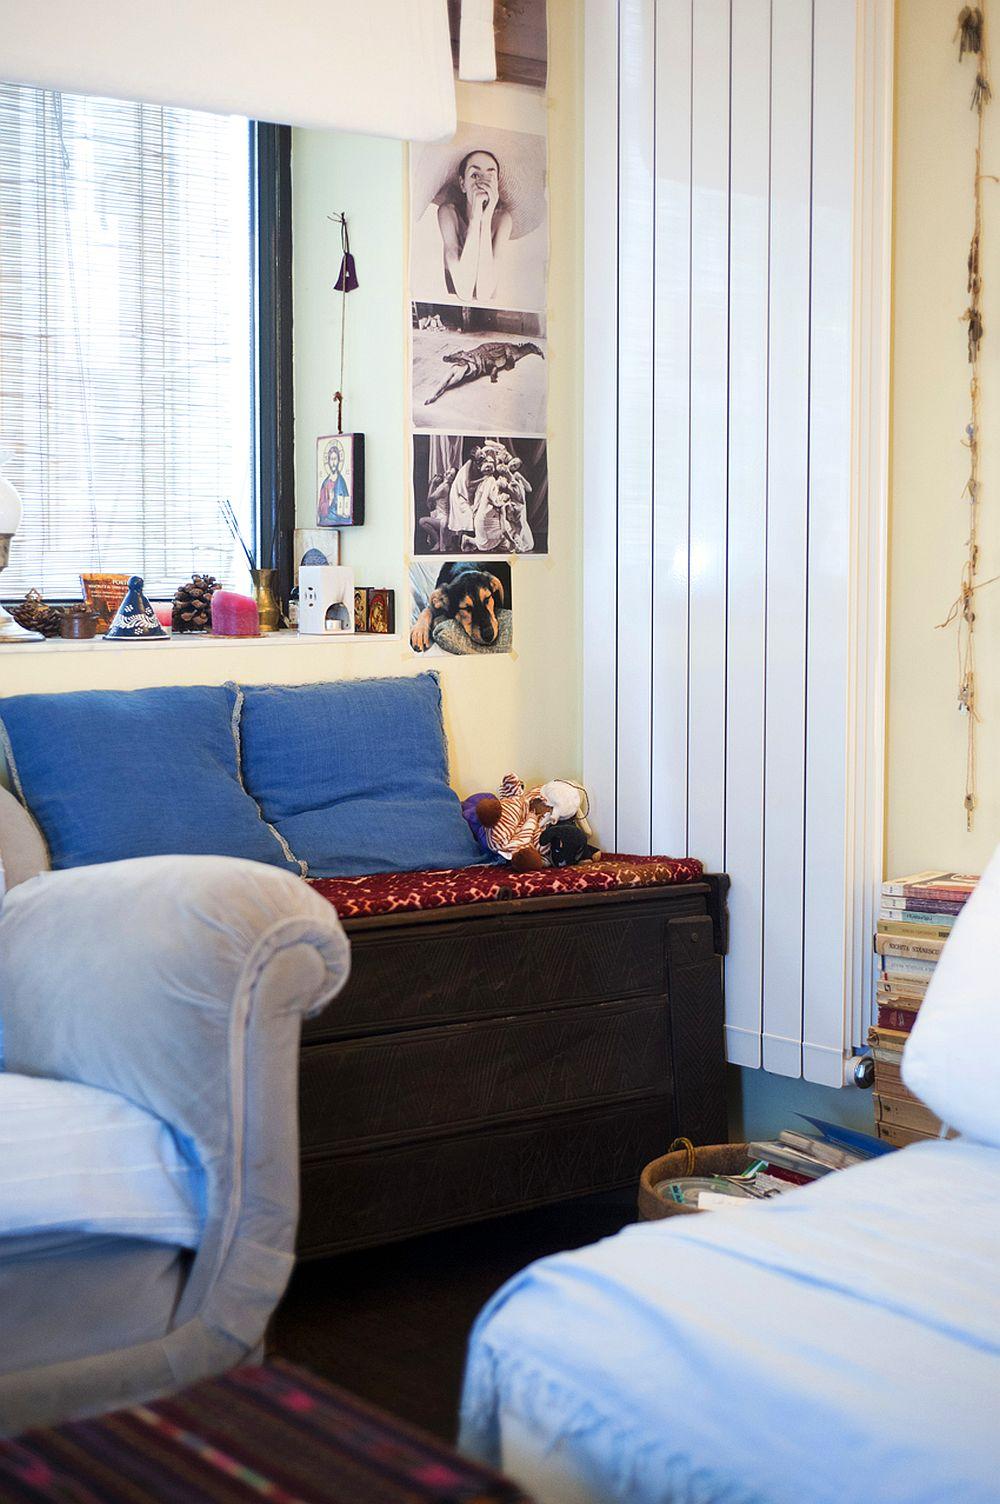 adelaparvu.com despre apartament boem de doua camere Bucuresti, designer Mihaela Poenaru, Foto Dragos Boldea (15)